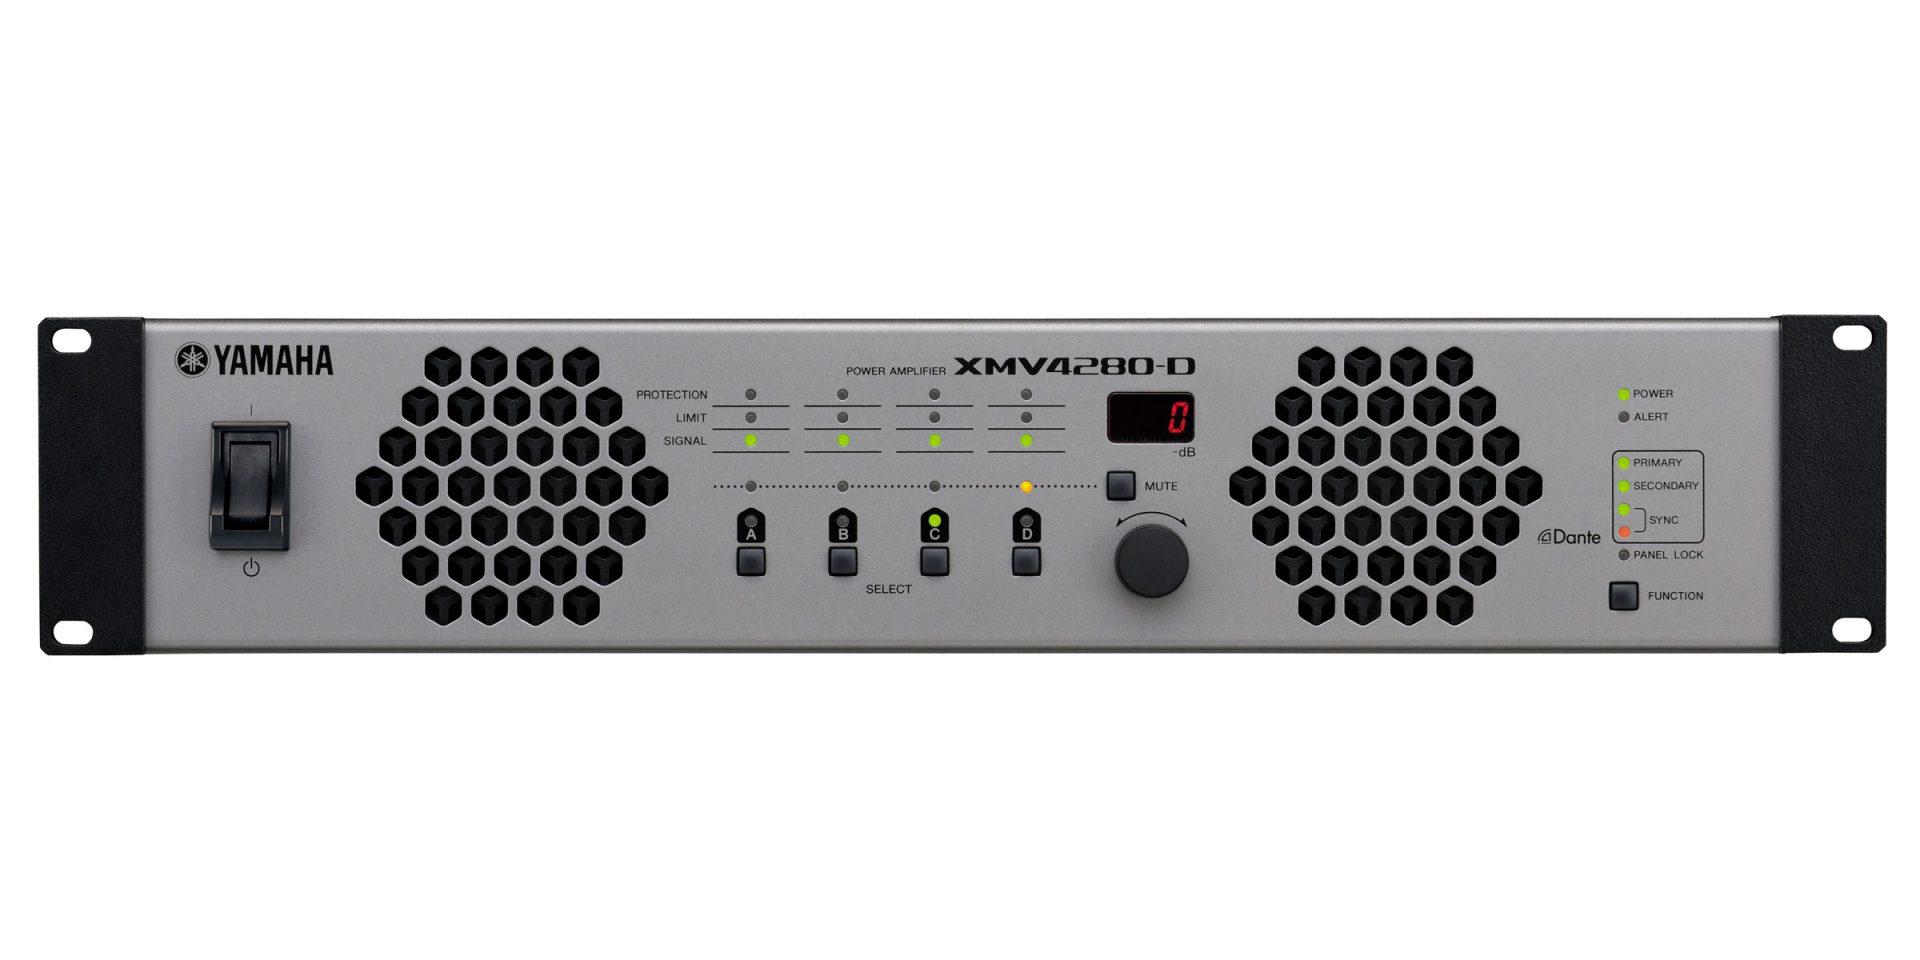 Yamaha XMV4280-D